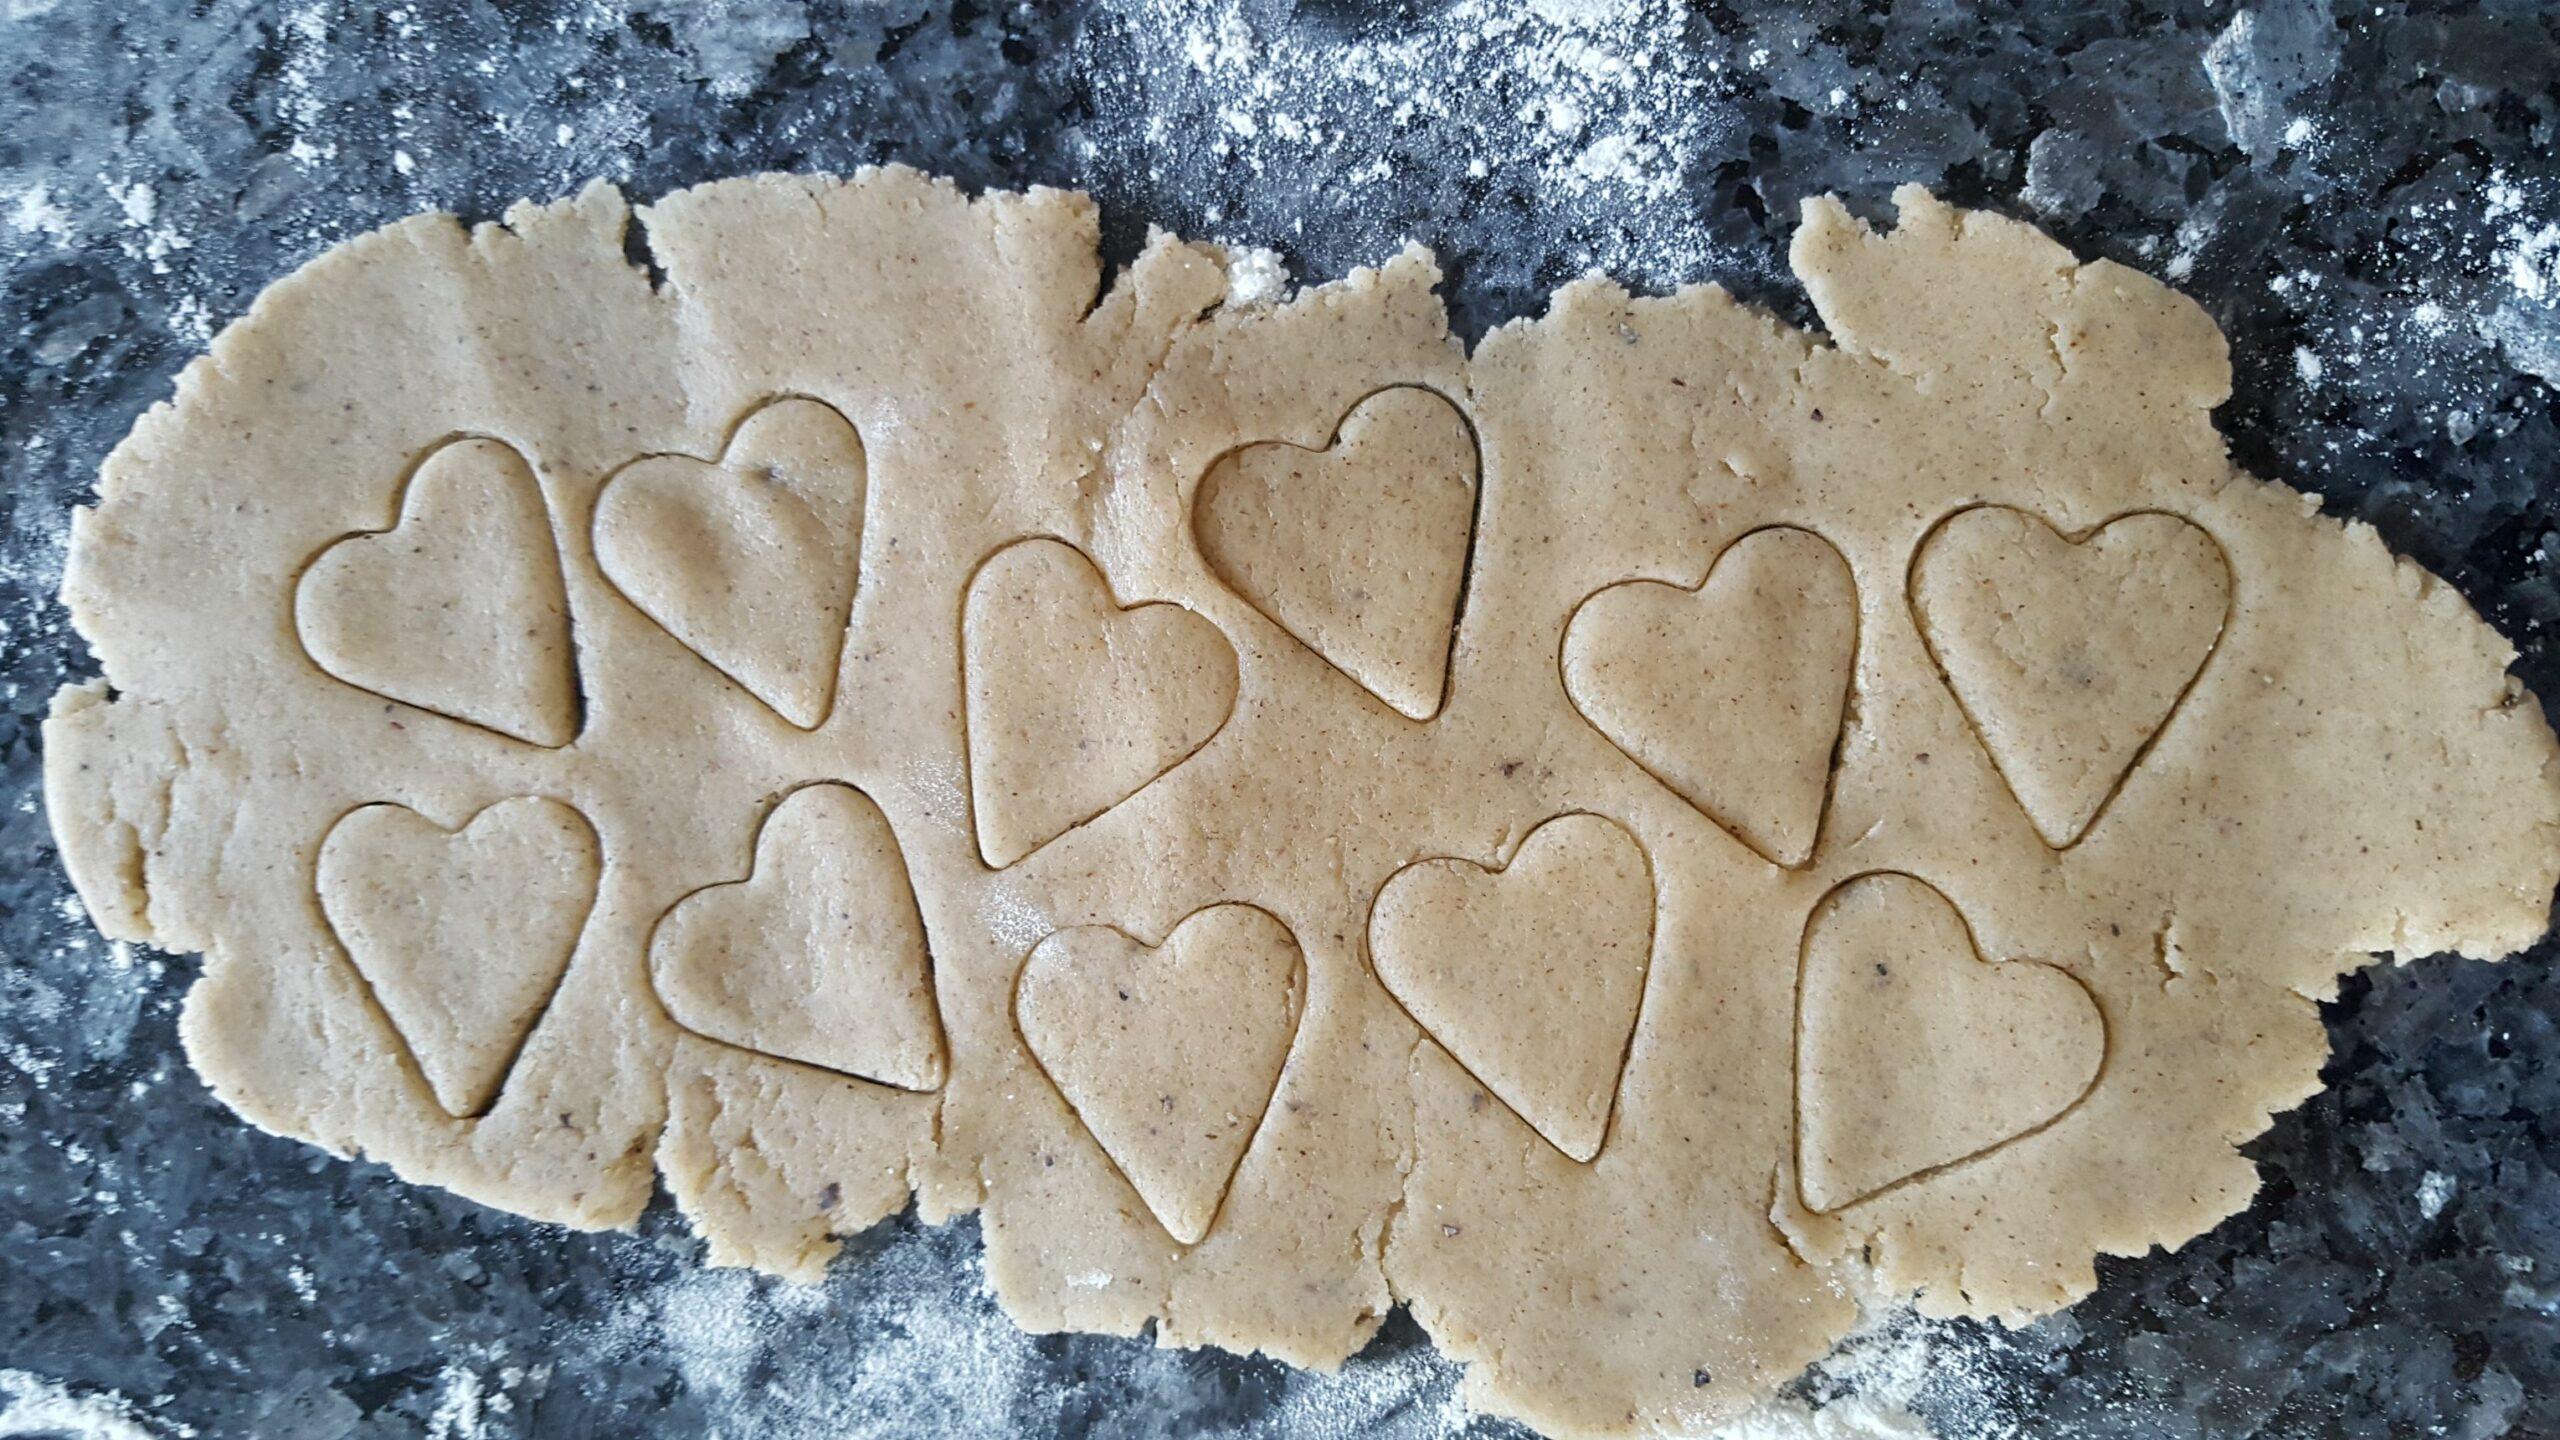 Danish gingerbread cookies christmas cookies gingerbread pebernødder Christmas cookies